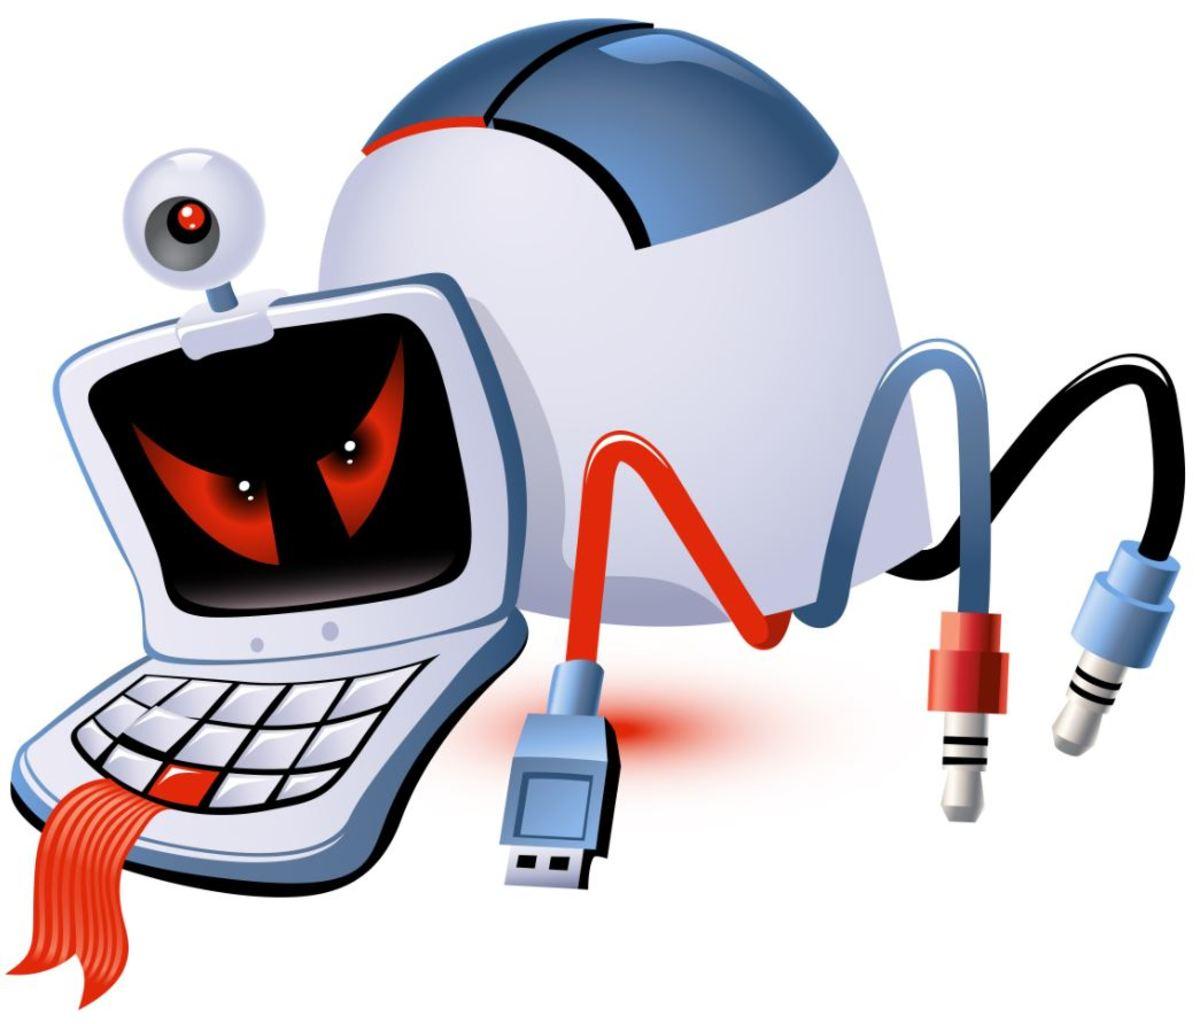 Malware - it hides everywhere